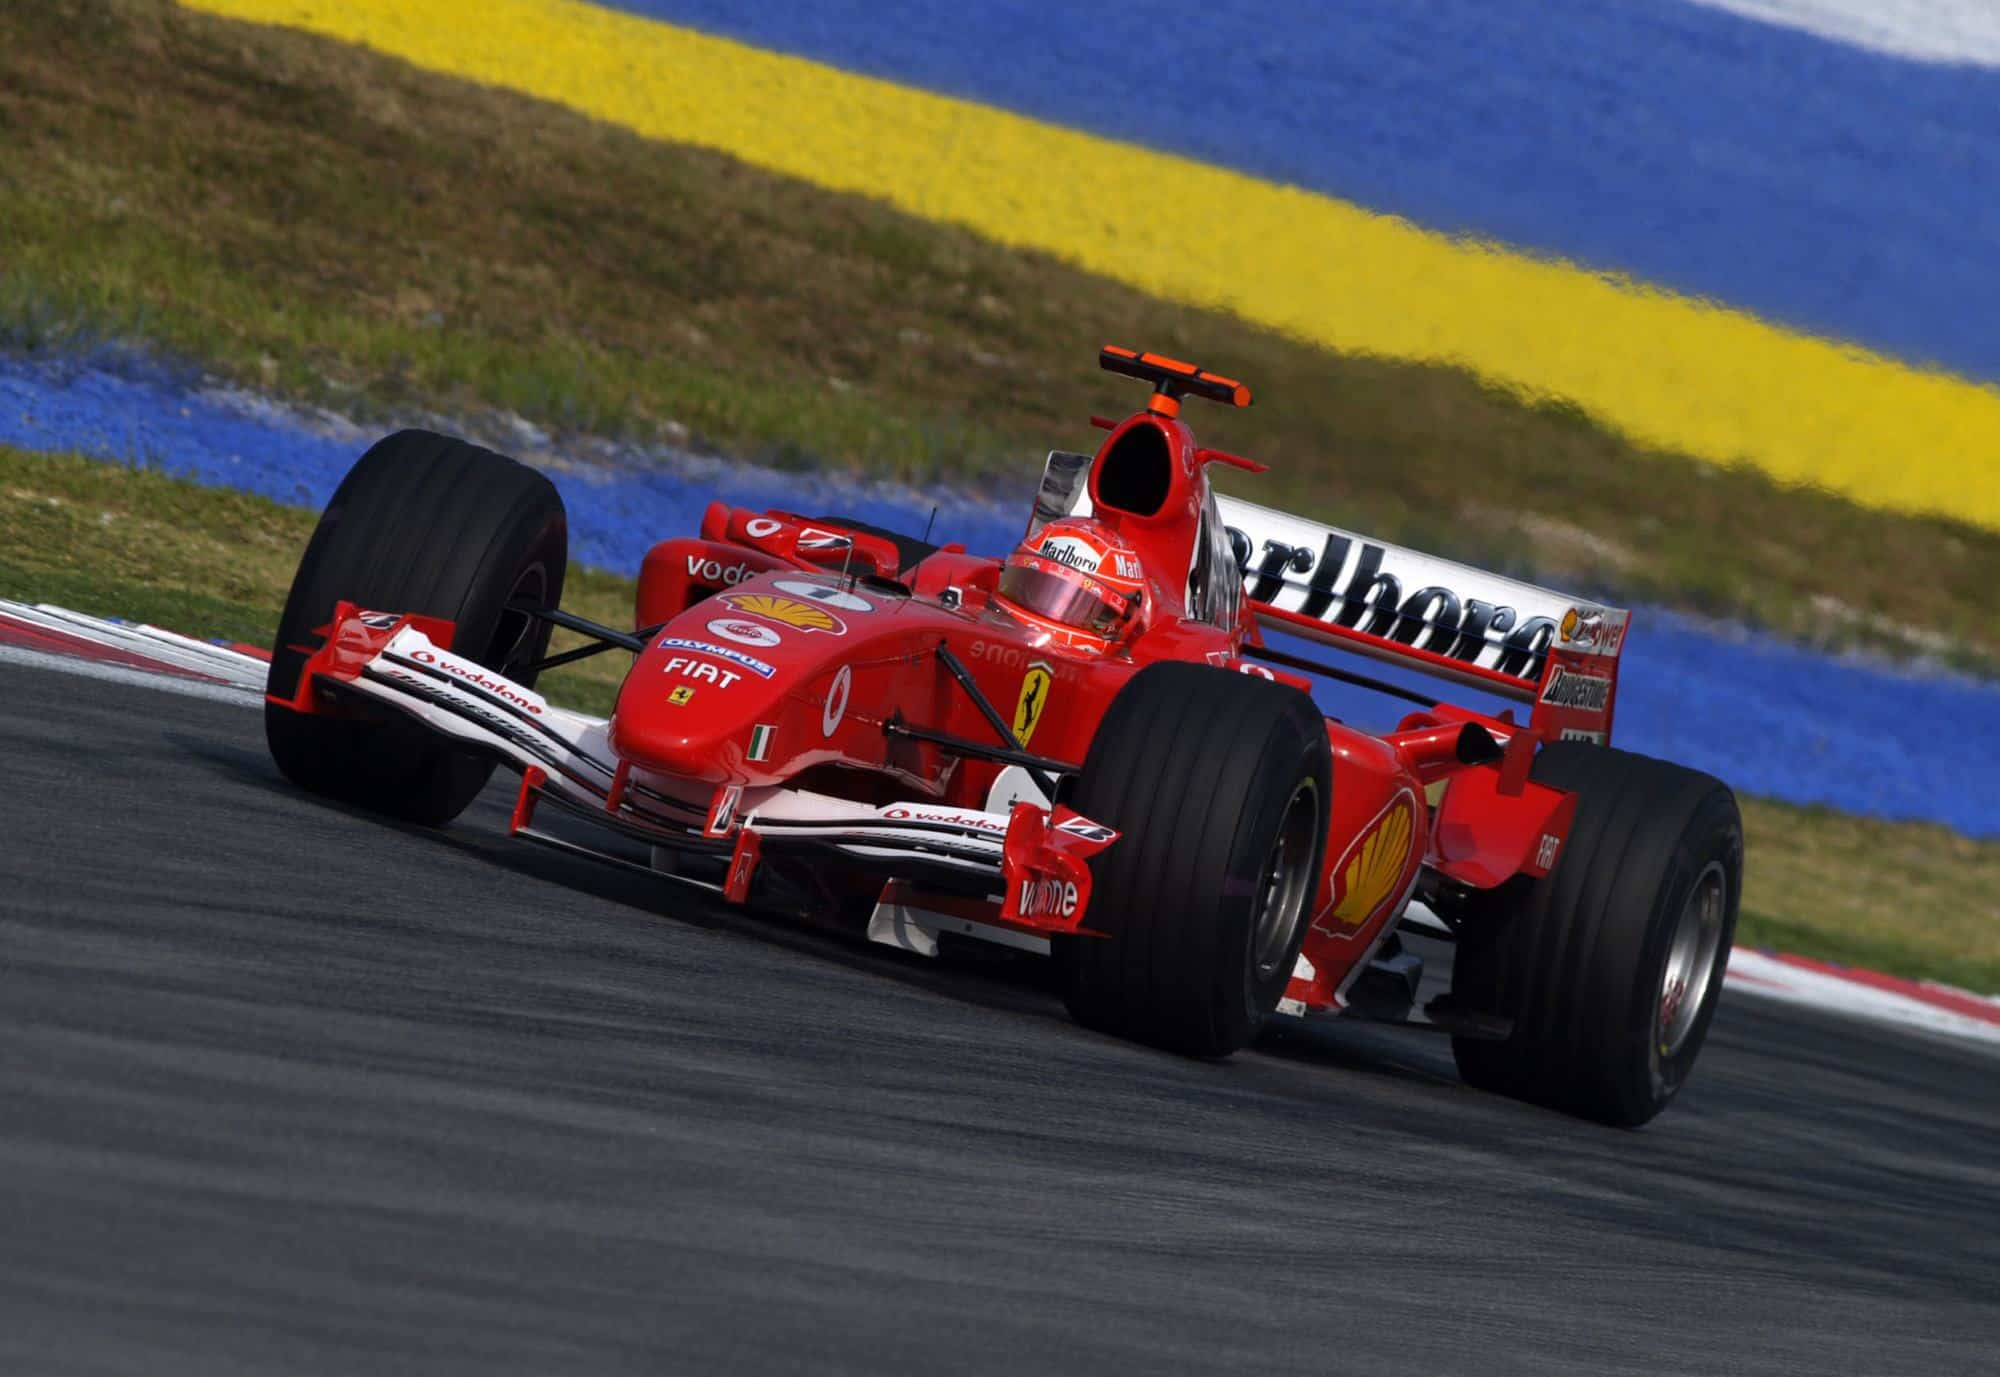 2005-Malaysian-GP-F1-Michael-Schumacher-Ferrari-F2004M-Photo-Ferrari